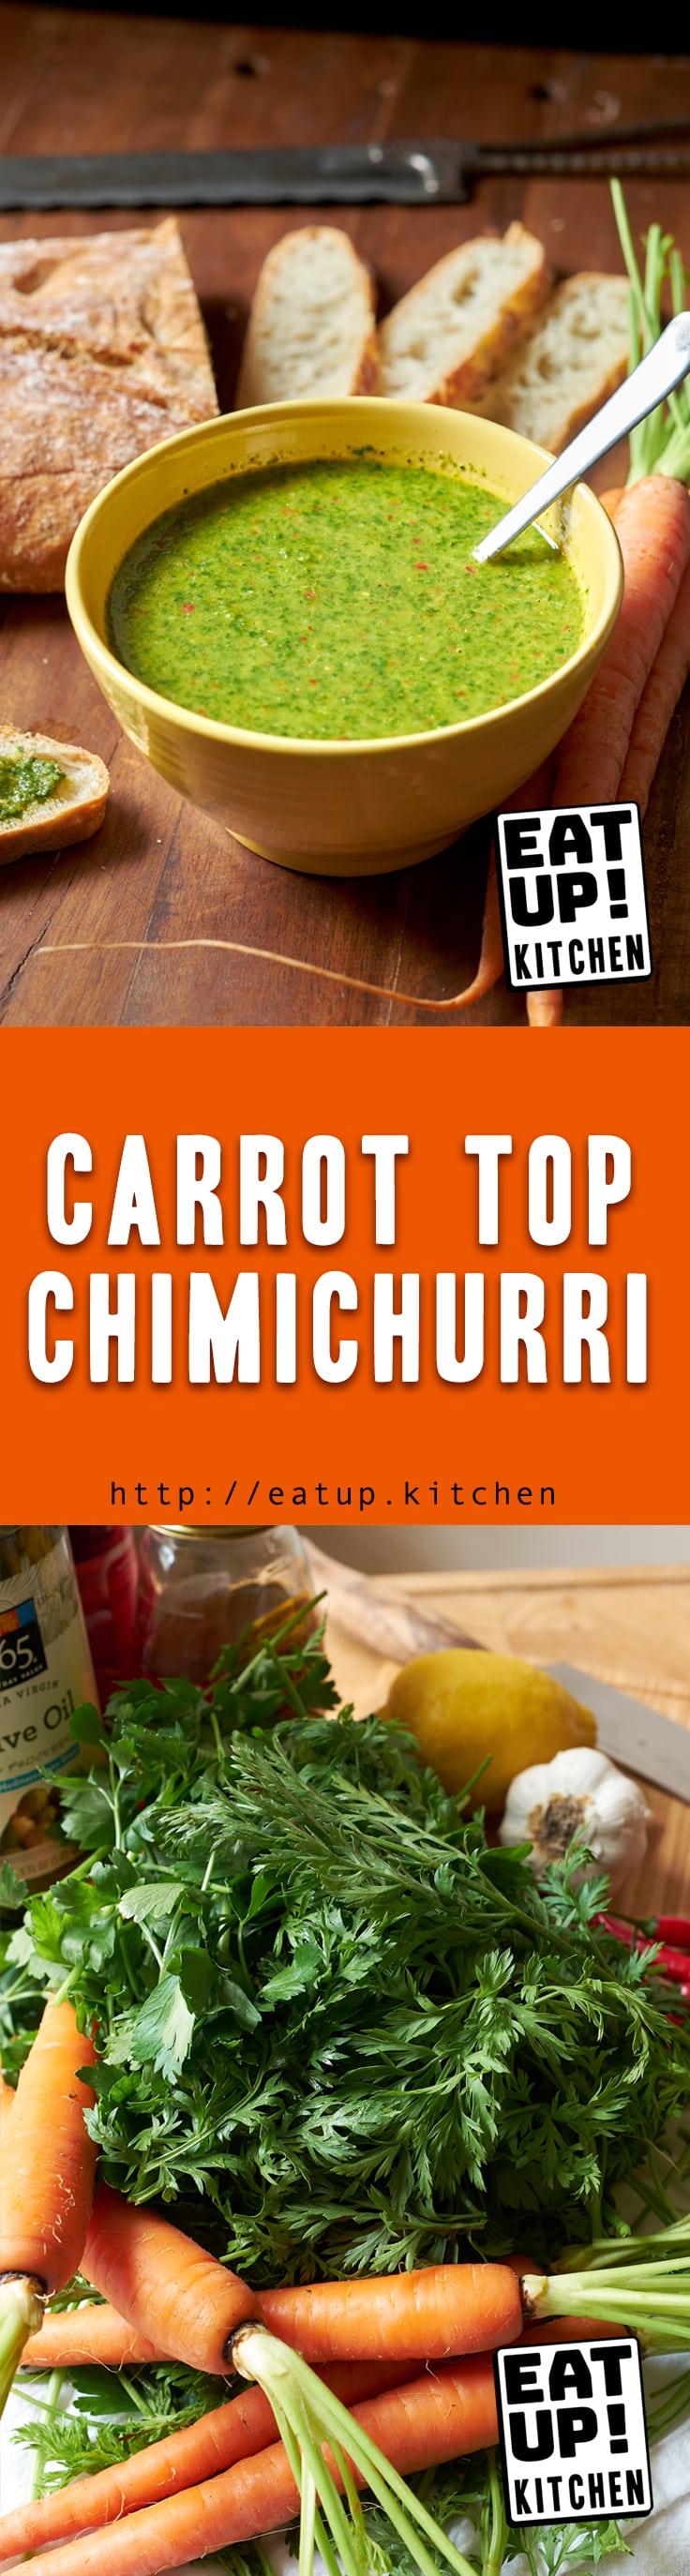 Carrot Top Chimichurri